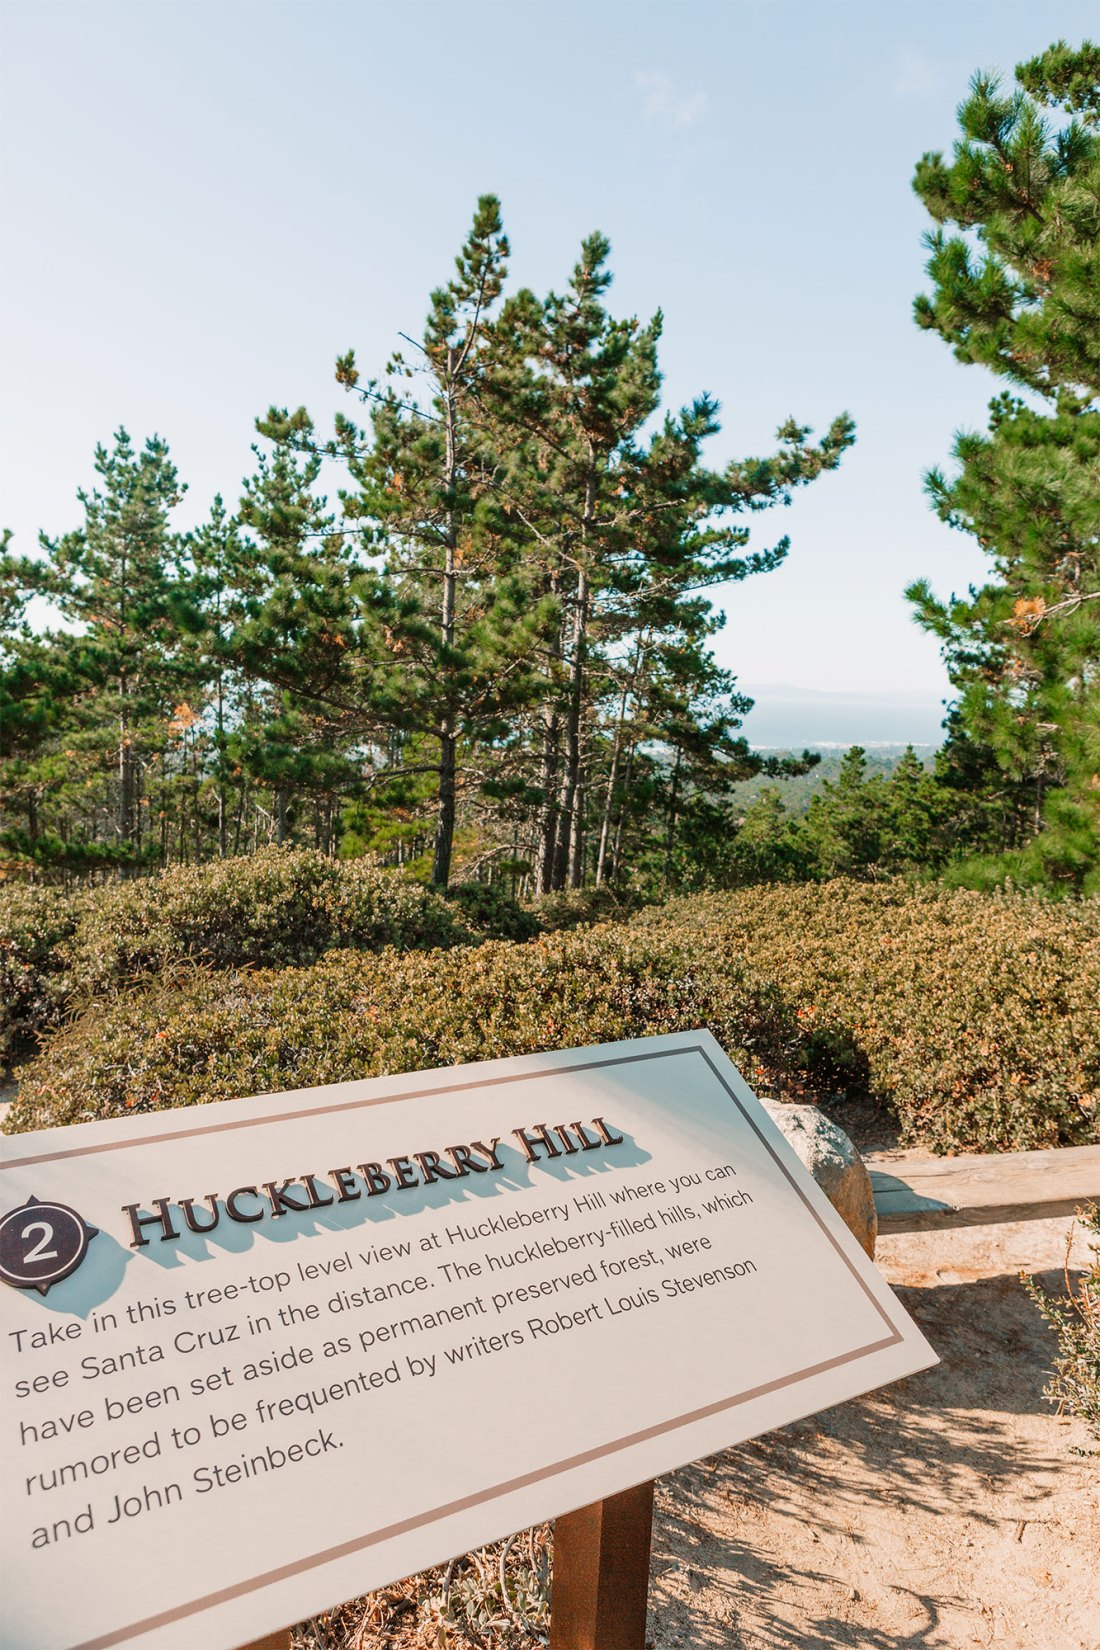 Huckleberry Hill in 17-Mile Drive Monterey, California